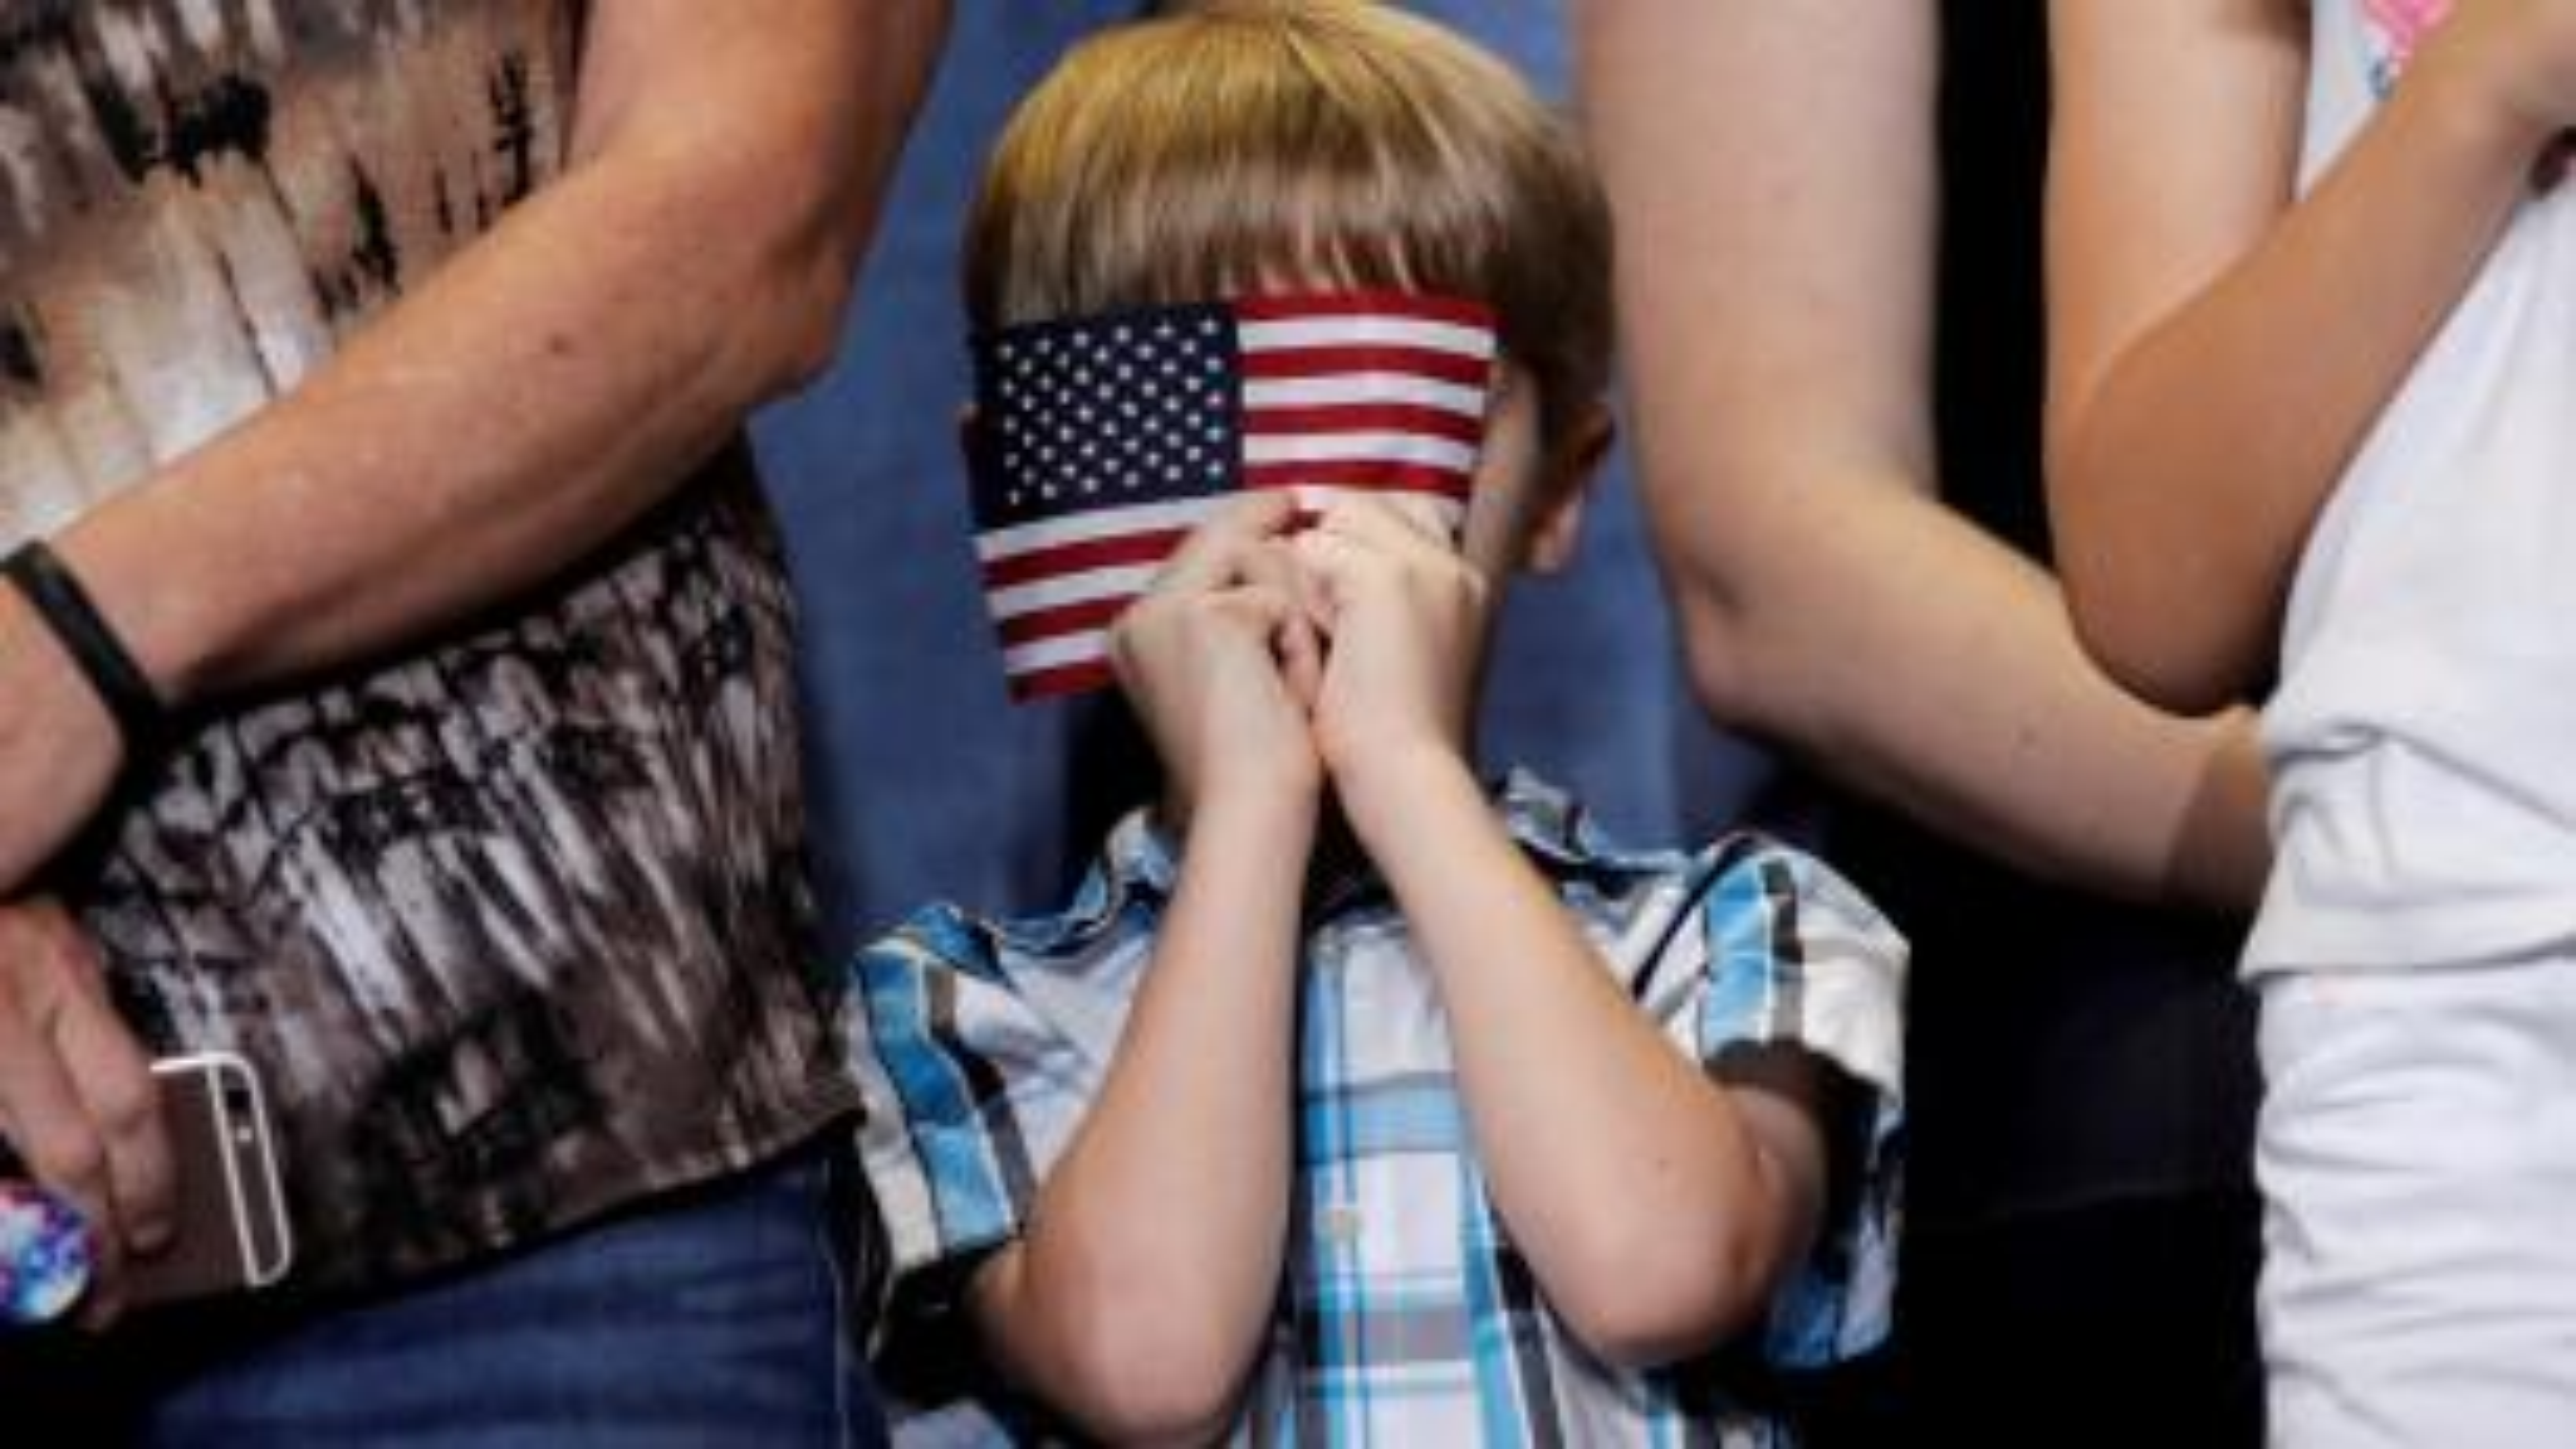 Boy hides behind US flag.